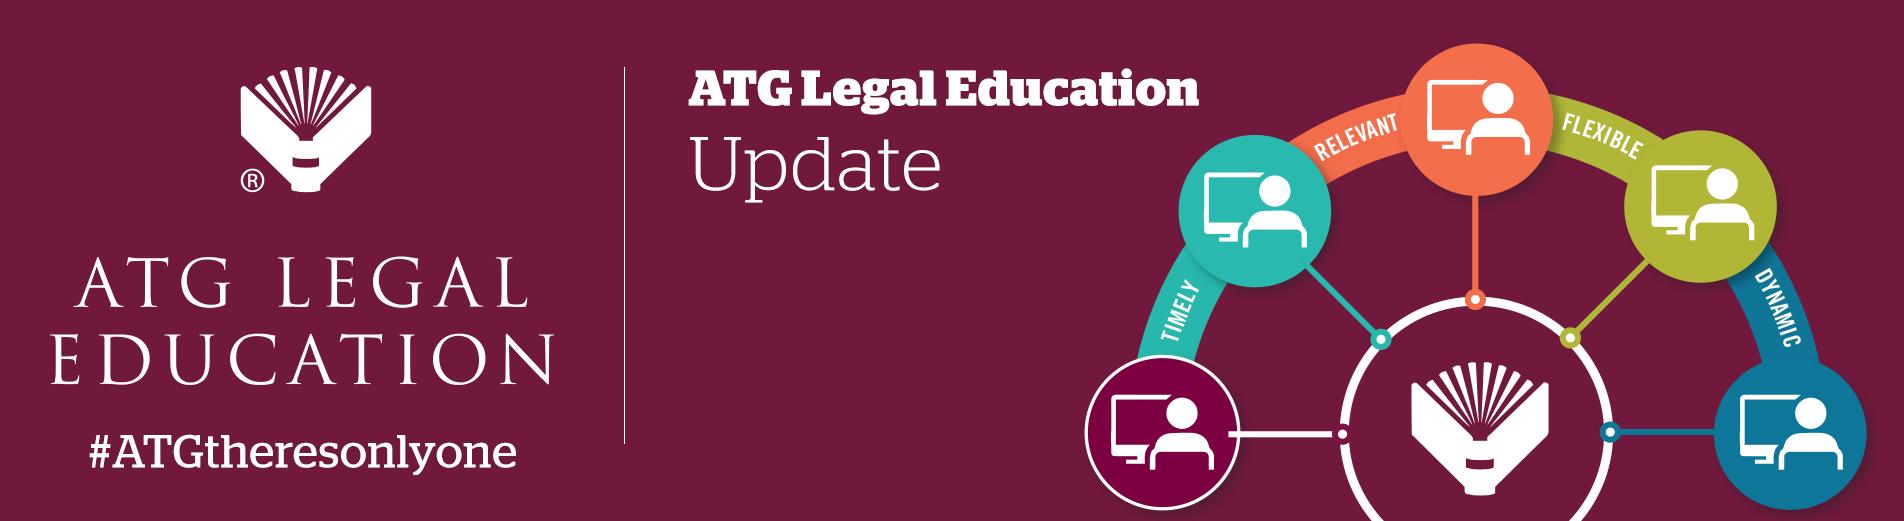 ATG Legal Ed banner.